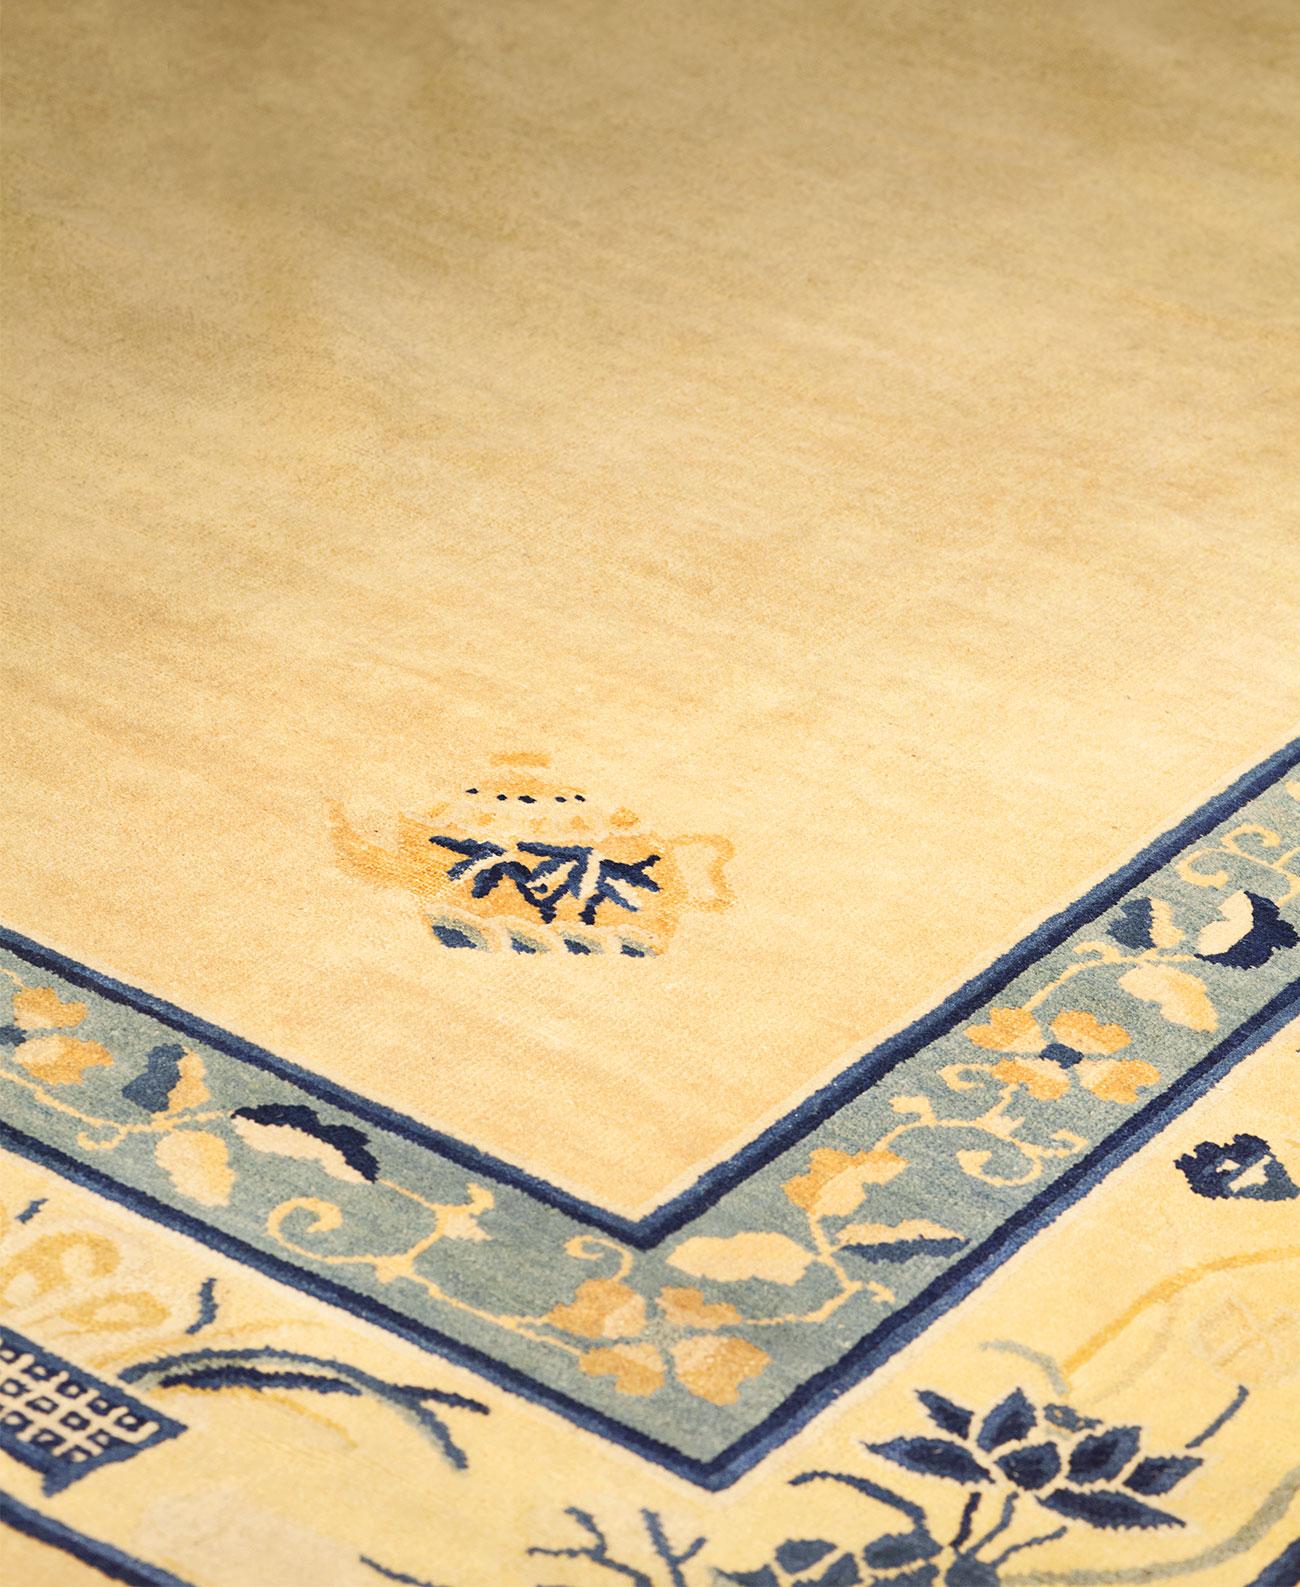 Custodia tappeti orientali